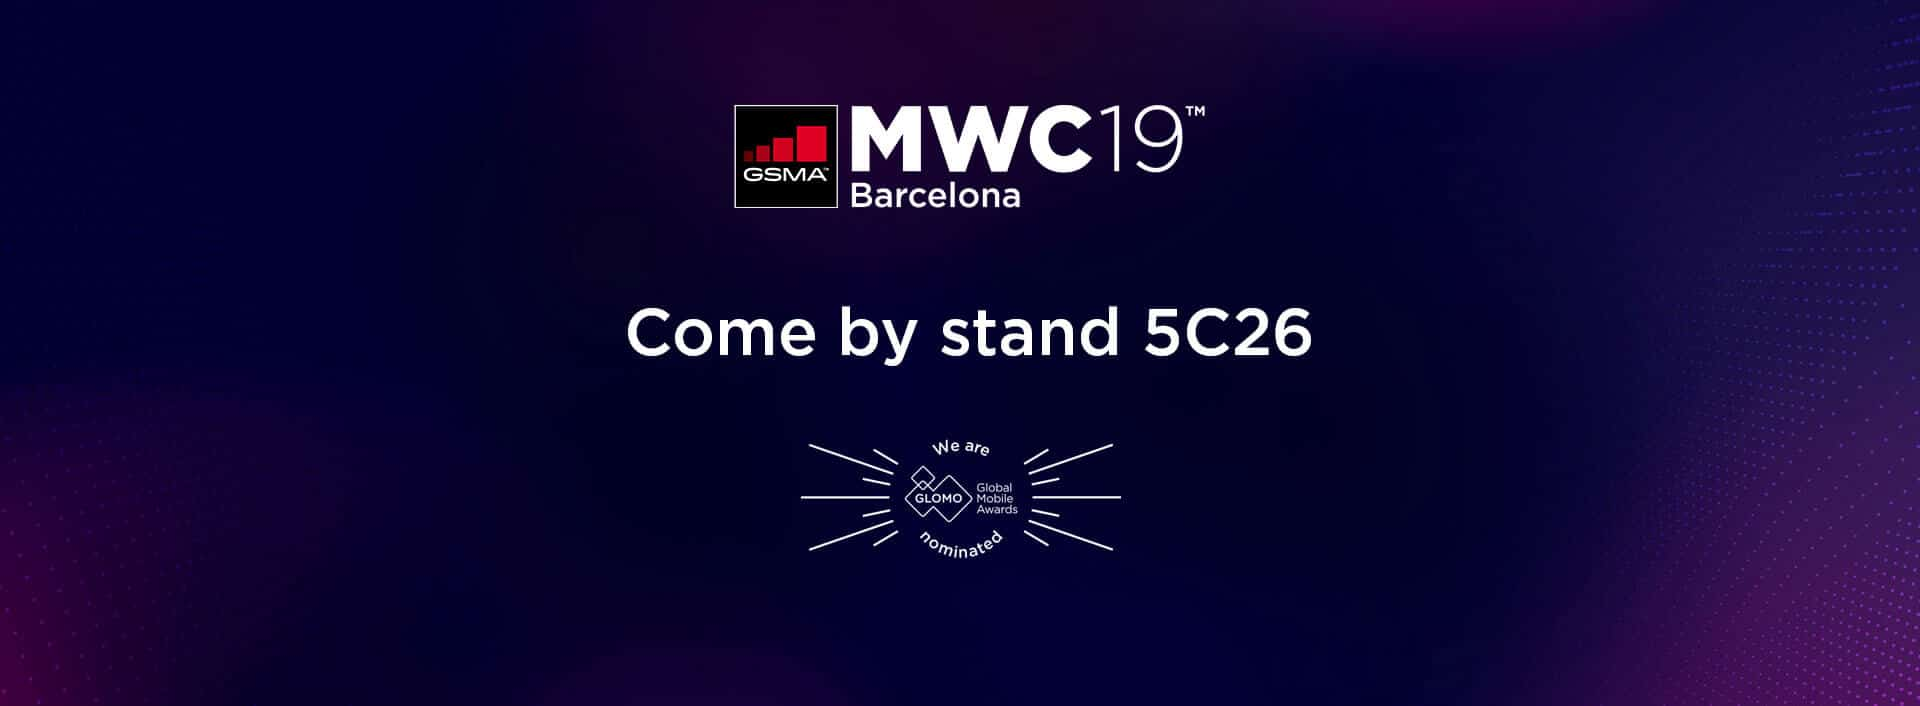 MWC19-header-v1